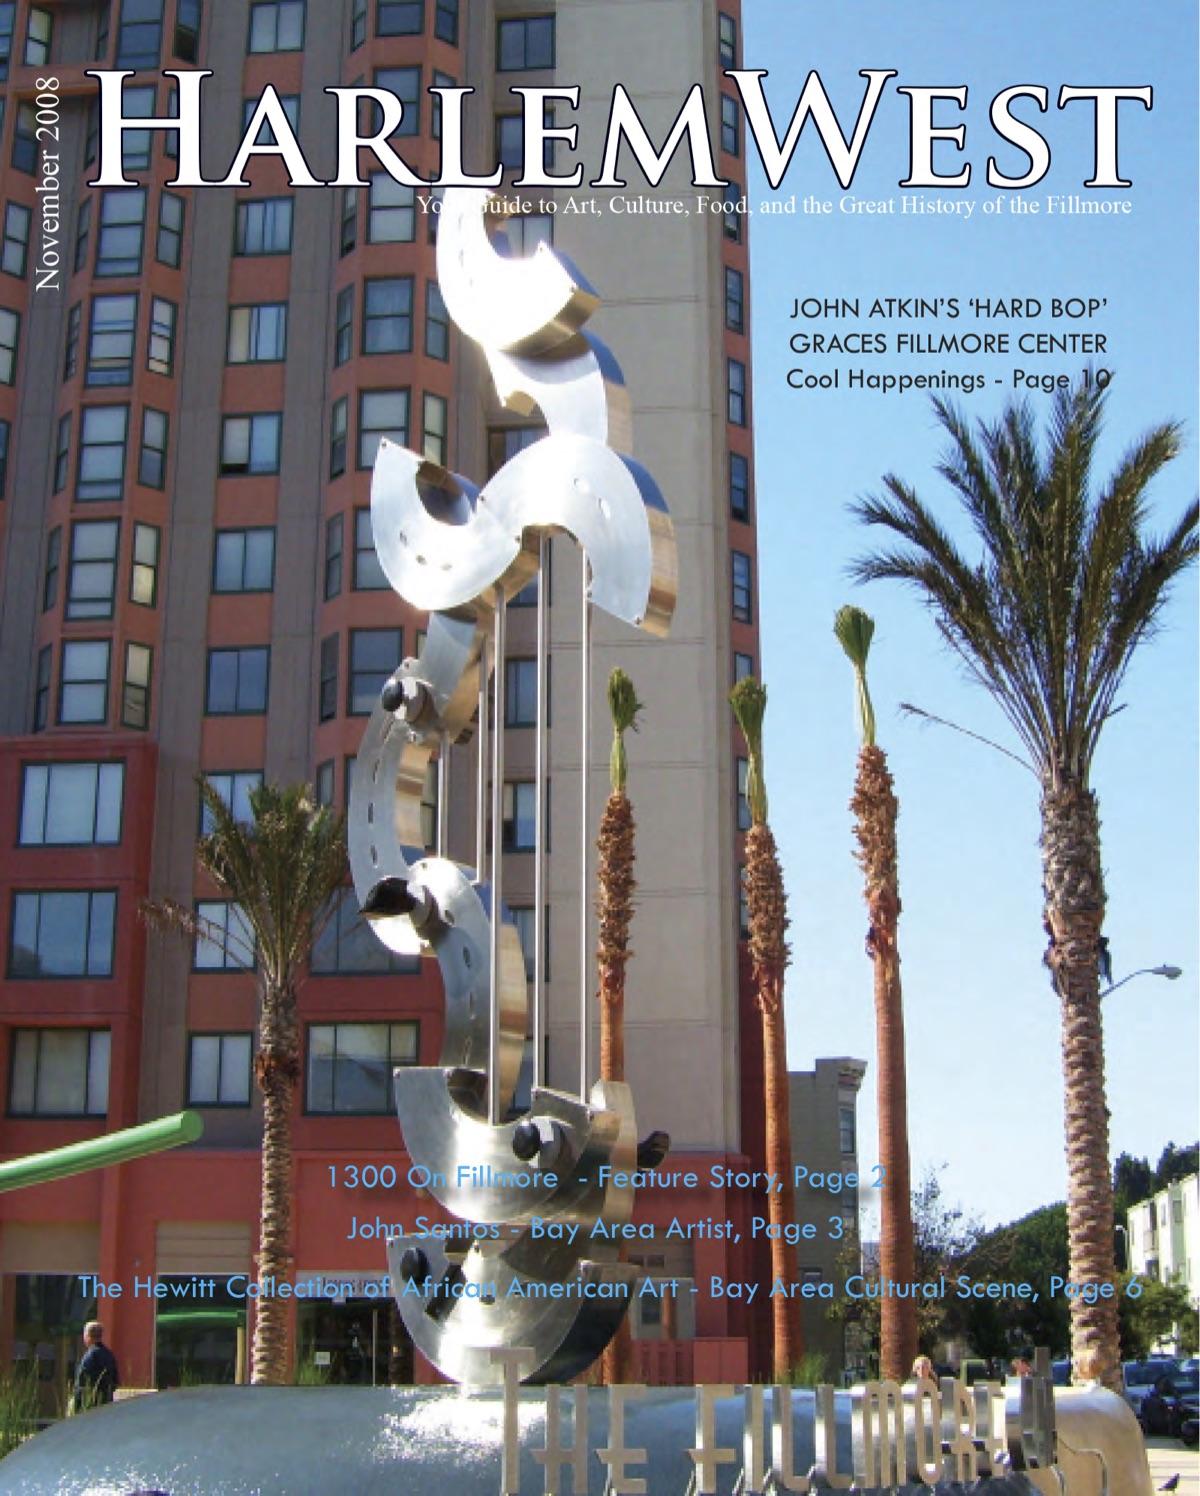 3.Harlem west Hard Bop review.jpg